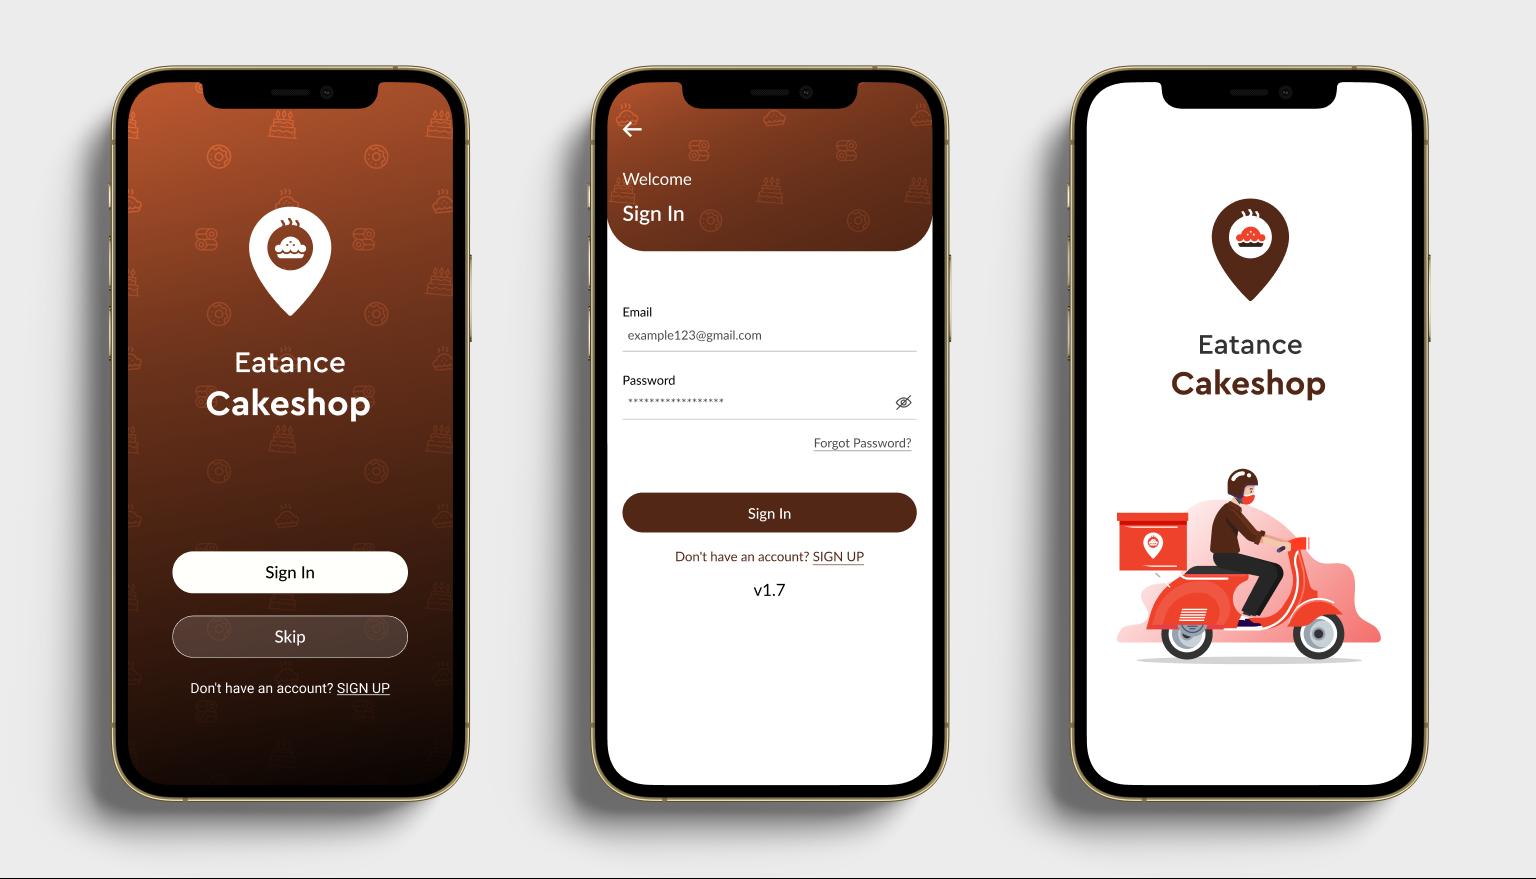 Eatance Cakeshop App